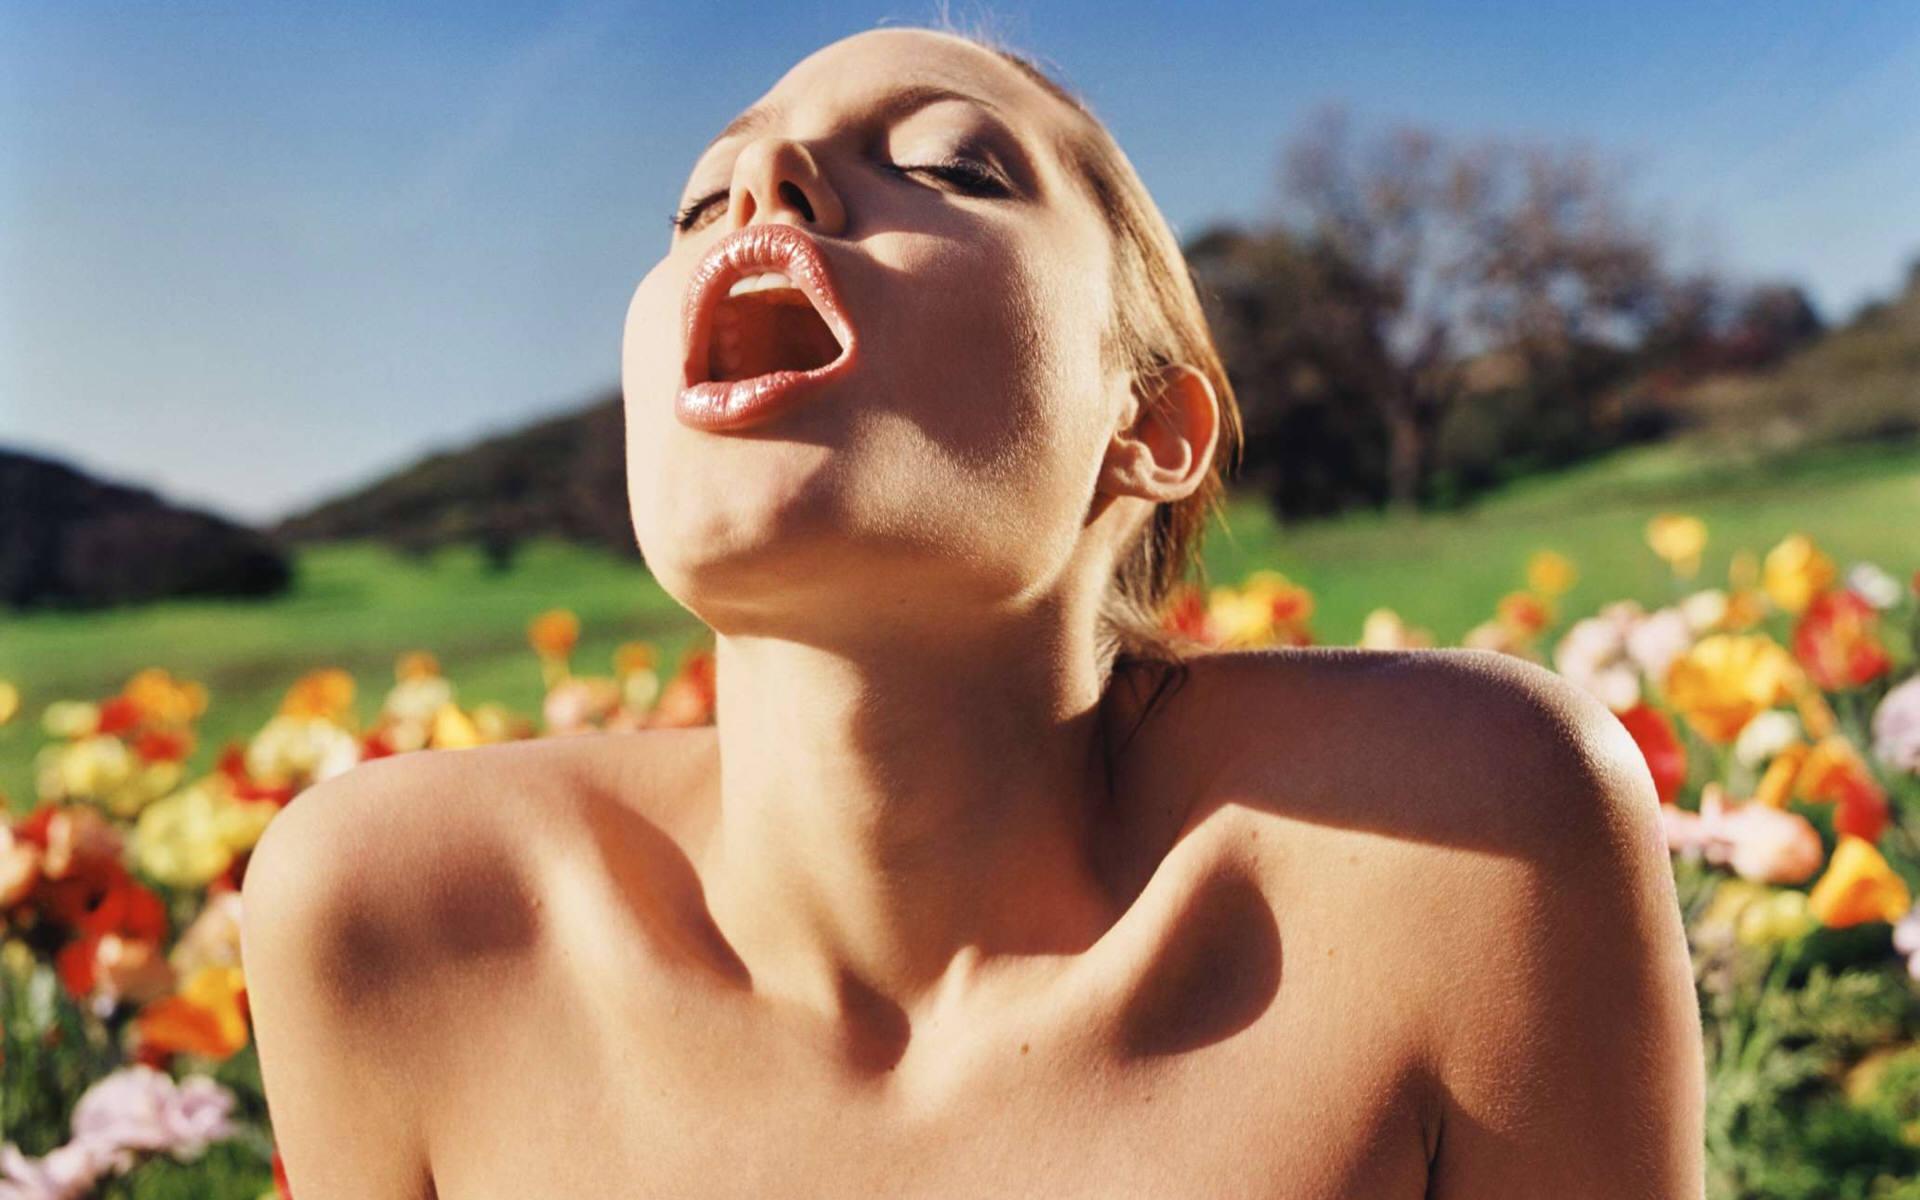 Оргазм телок фото и видео сайт